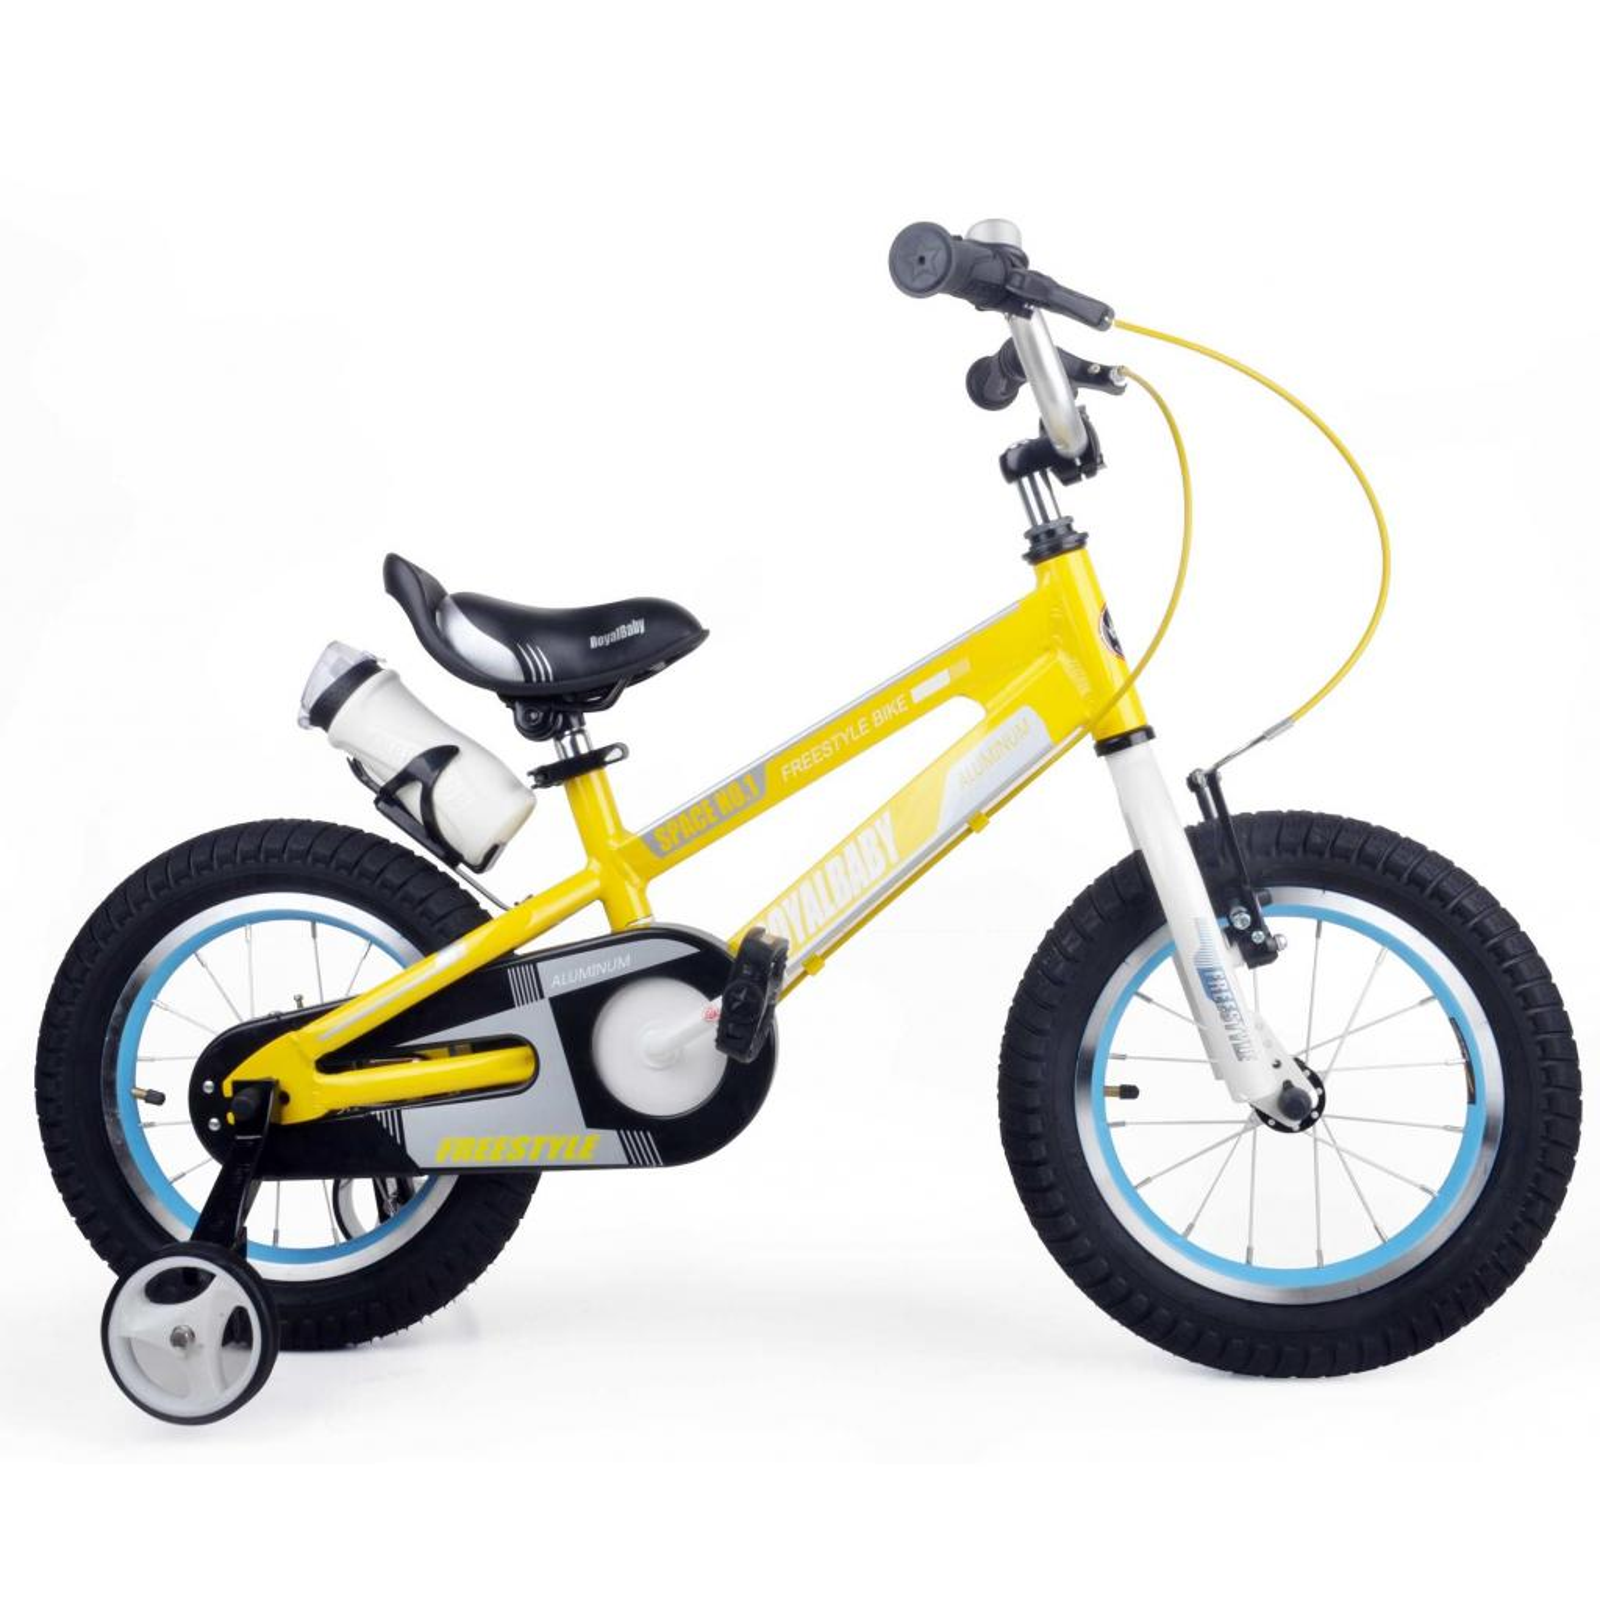 "Детский велосипед Royal Baby SPACE NO.1 Alu 18"", желтый (RB18-17-YEL)"